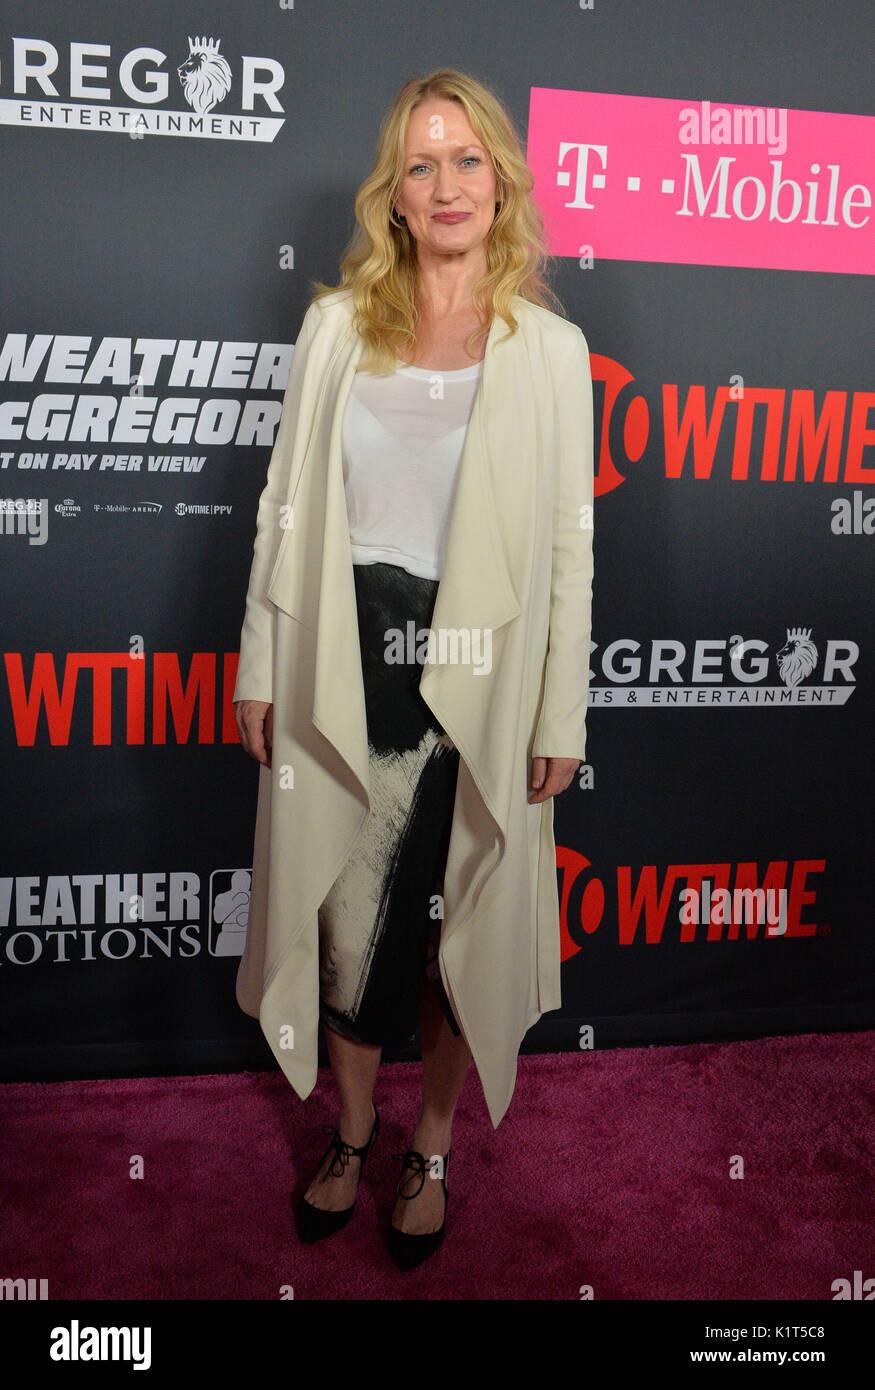 Hot Jennifer Wenger nudes (73 photo), Tits, Leaked, Boobs, lingerie 2020